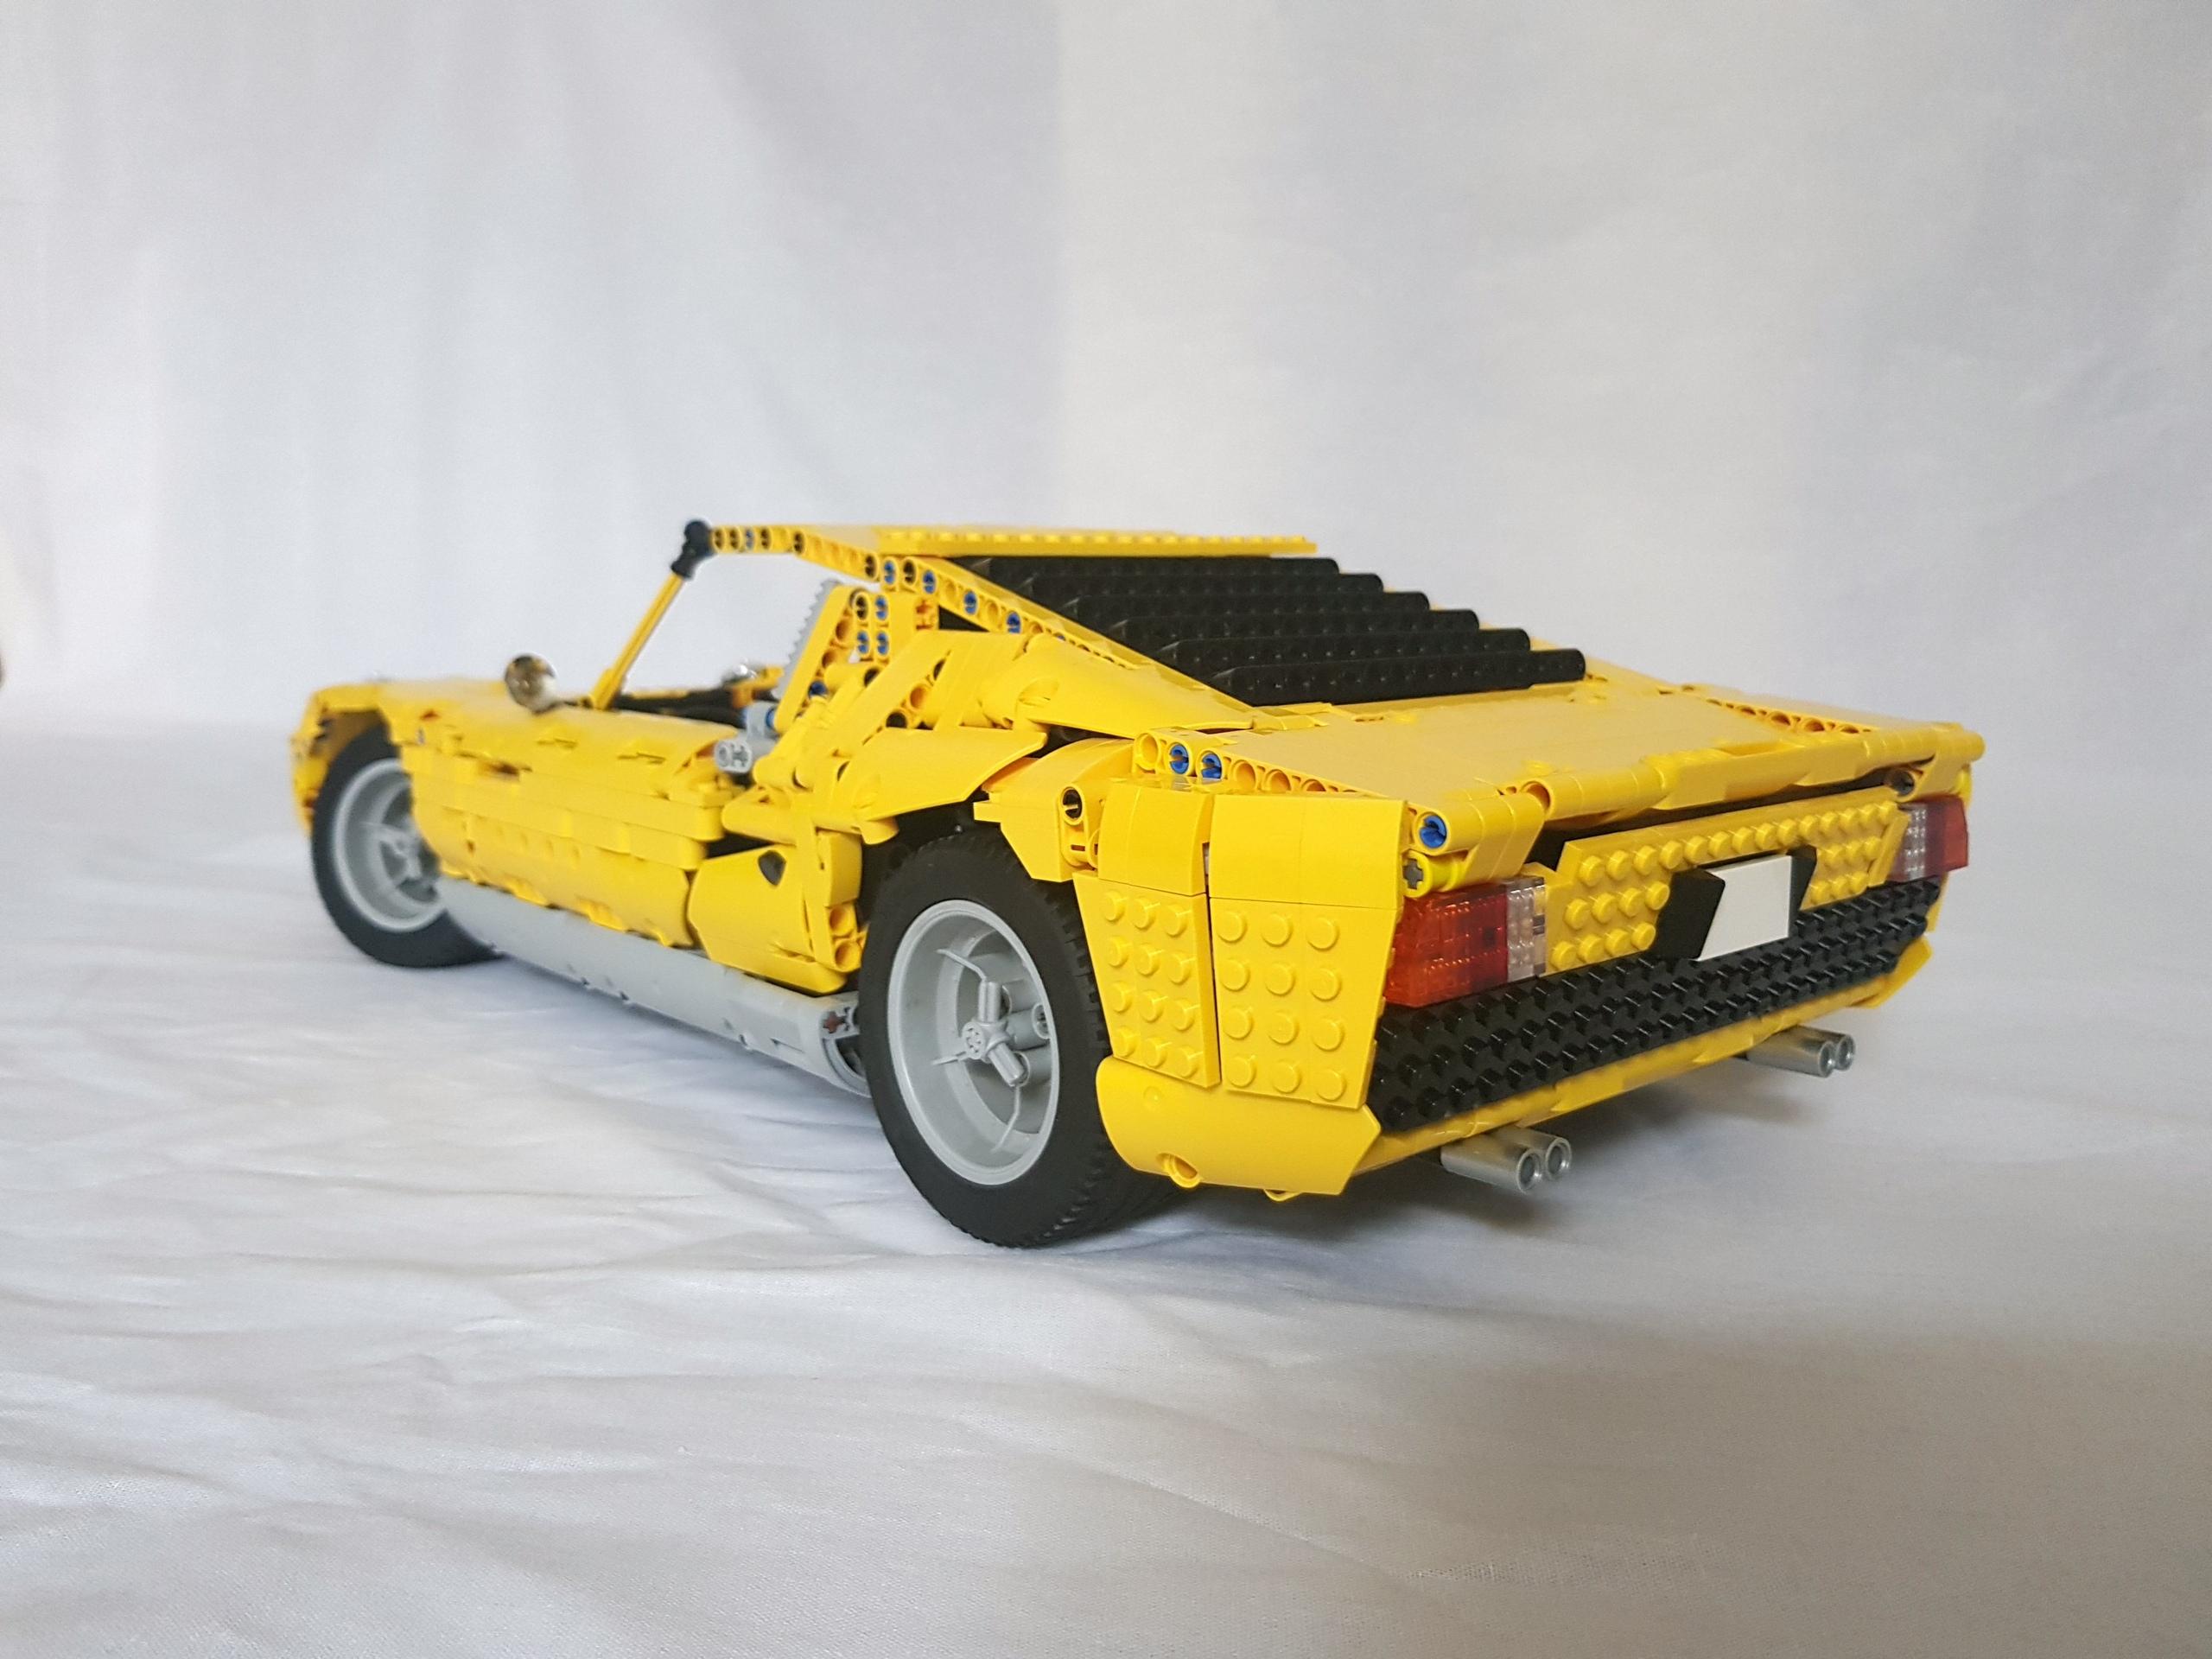 Lego Moc 24294 Lamborghini Miura Technic Model 2019